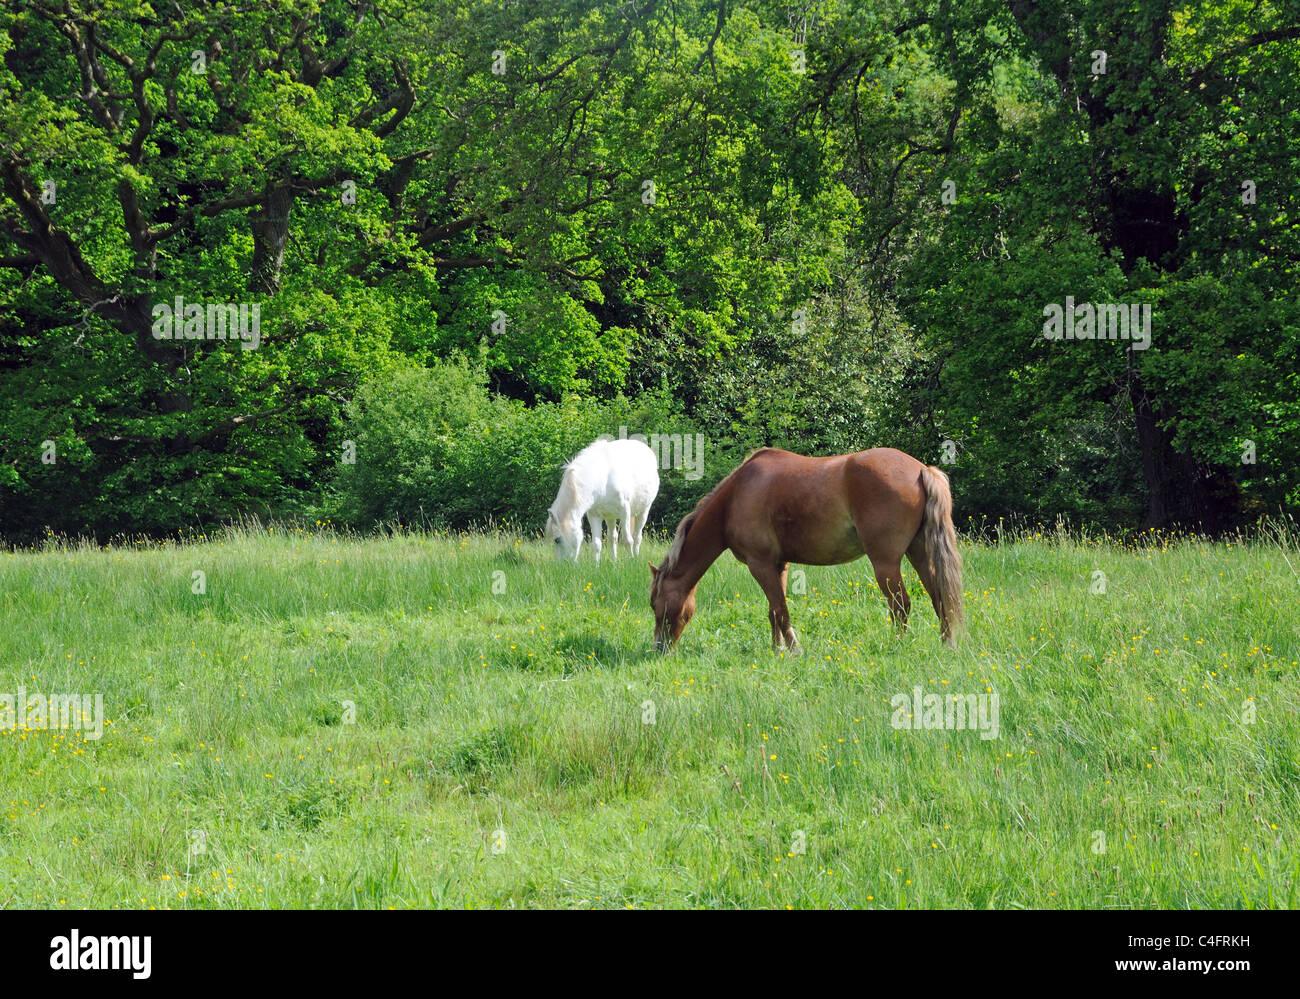 Horses grazing in Llandygwydd, Cardiganshire, Wales - Stock Image